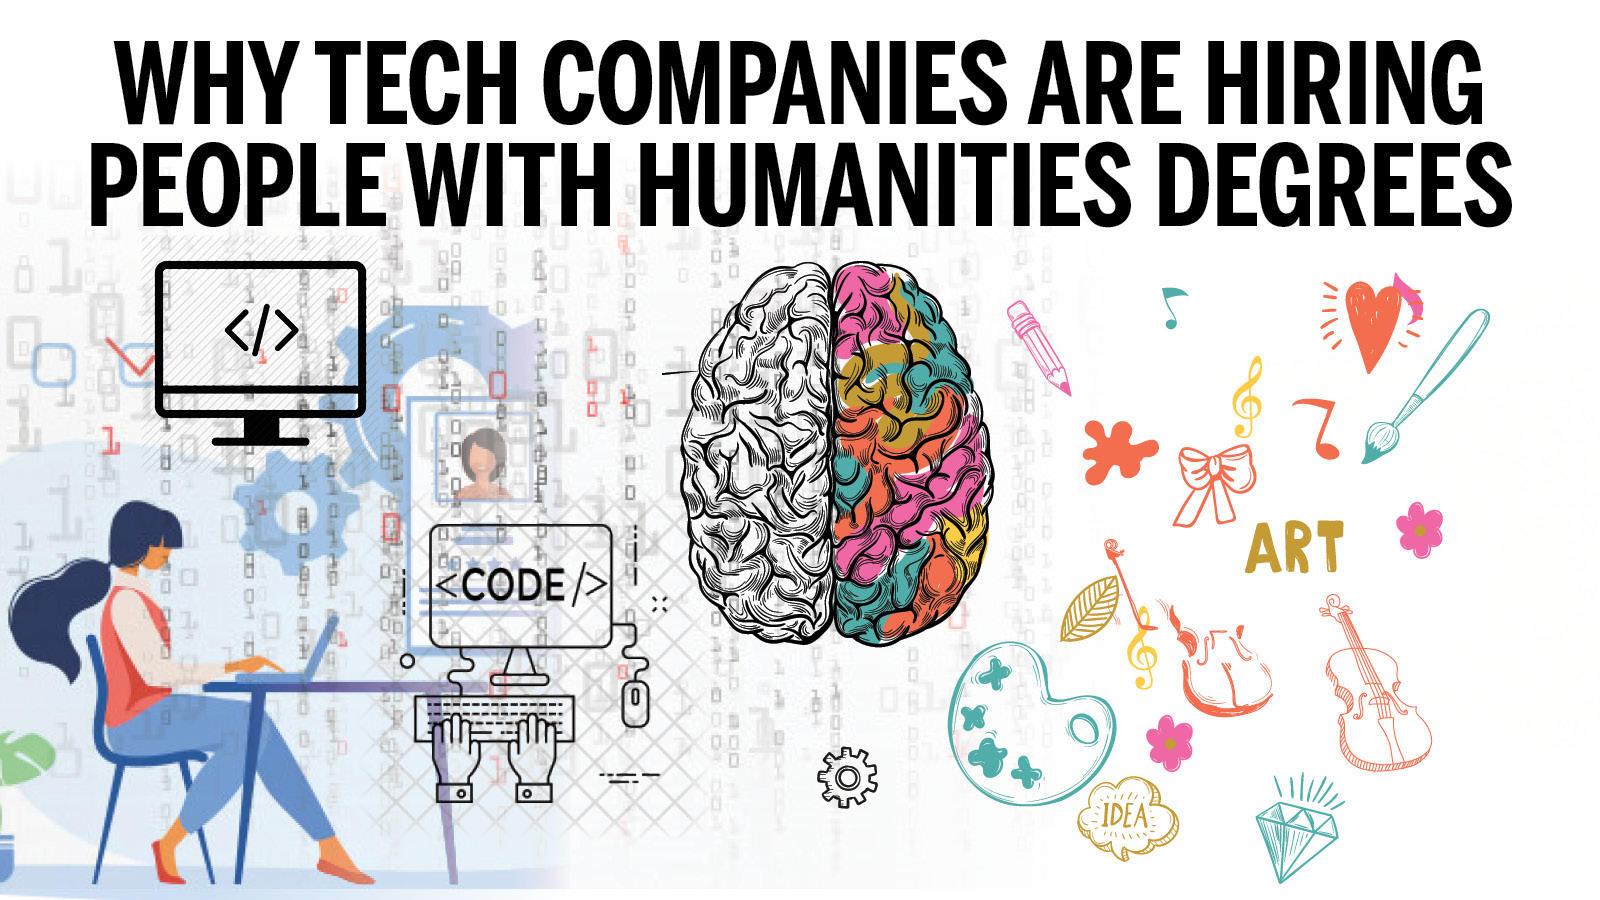 Photo on humanities hiring